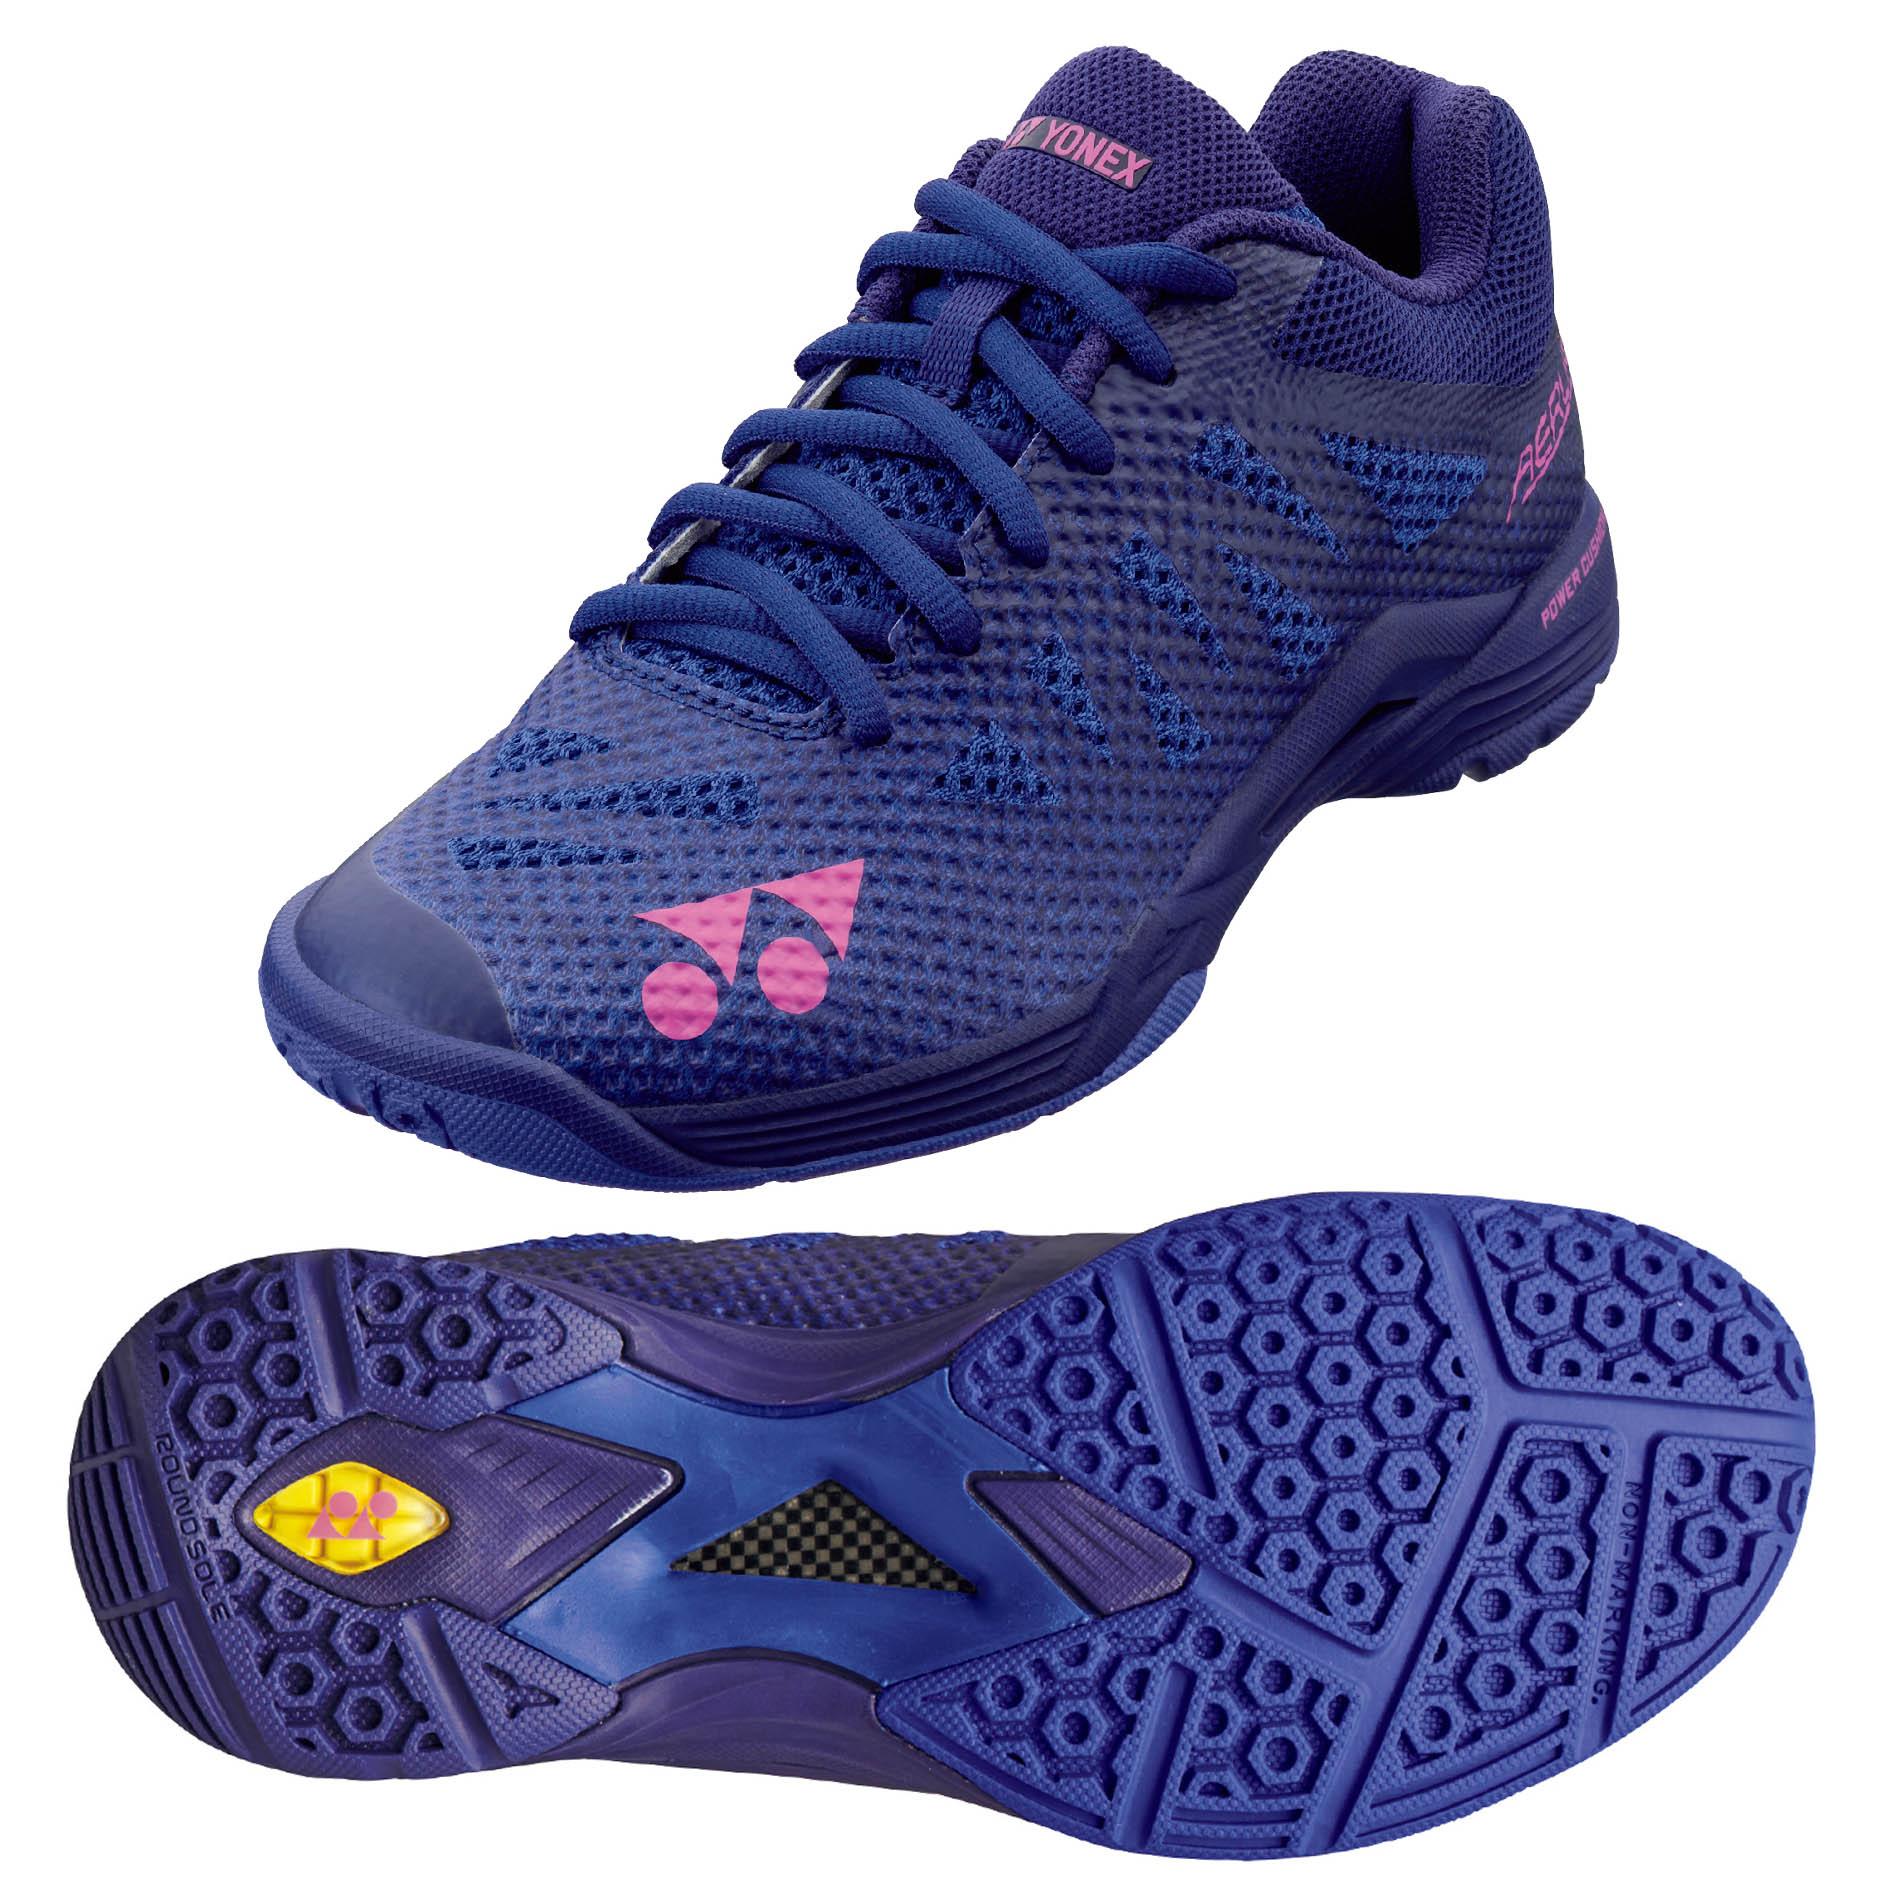 Yonex Power Cushion Aerus 3 Ladies Badminton Shoes - Navy Blue, 8 UK